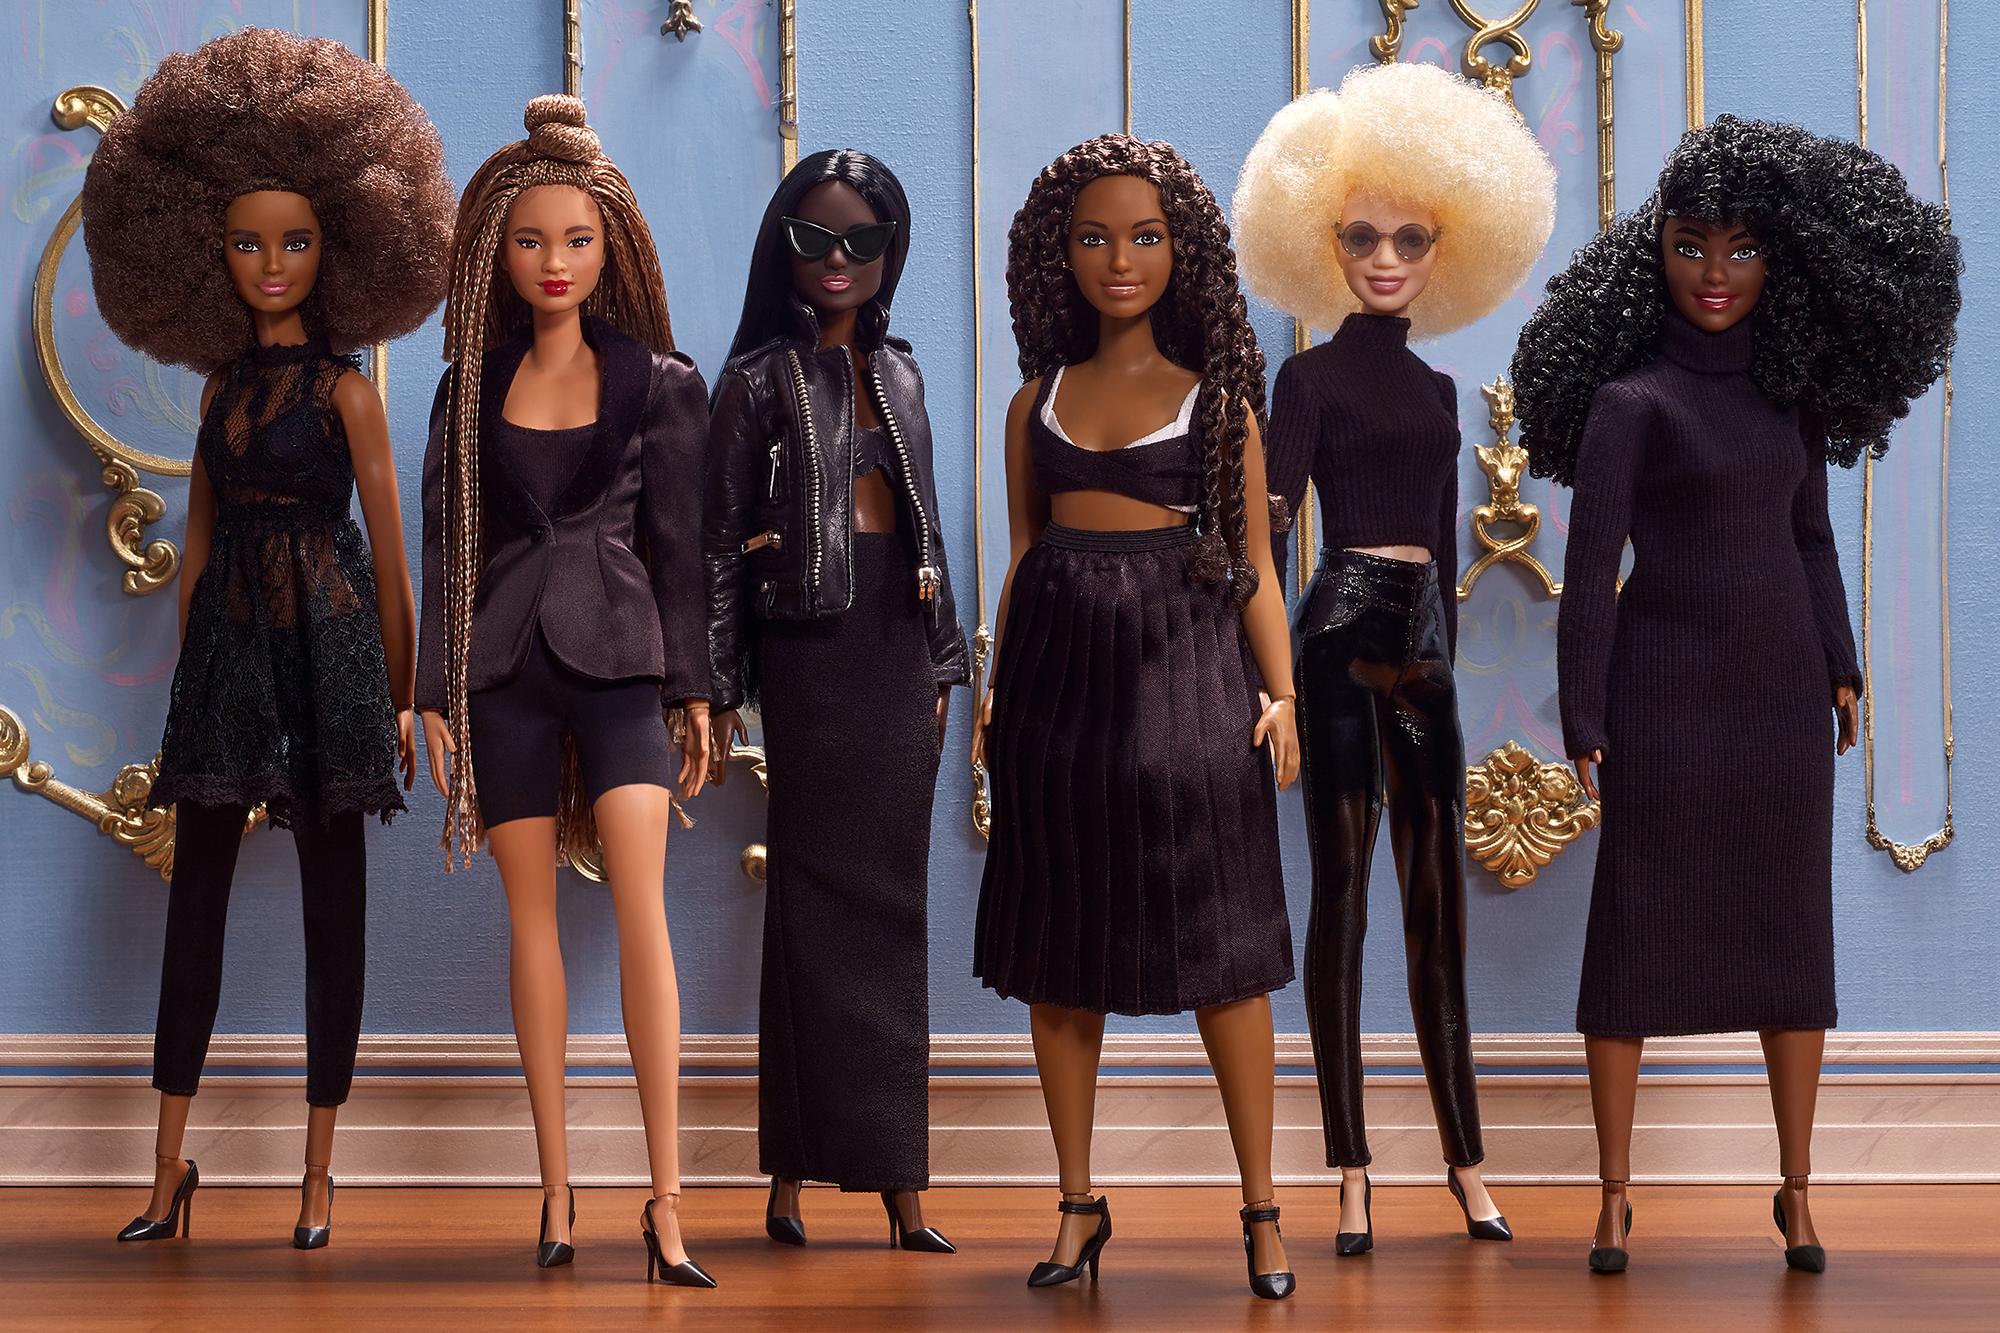 Queen Slim Designer Styled Black History Month Barbies